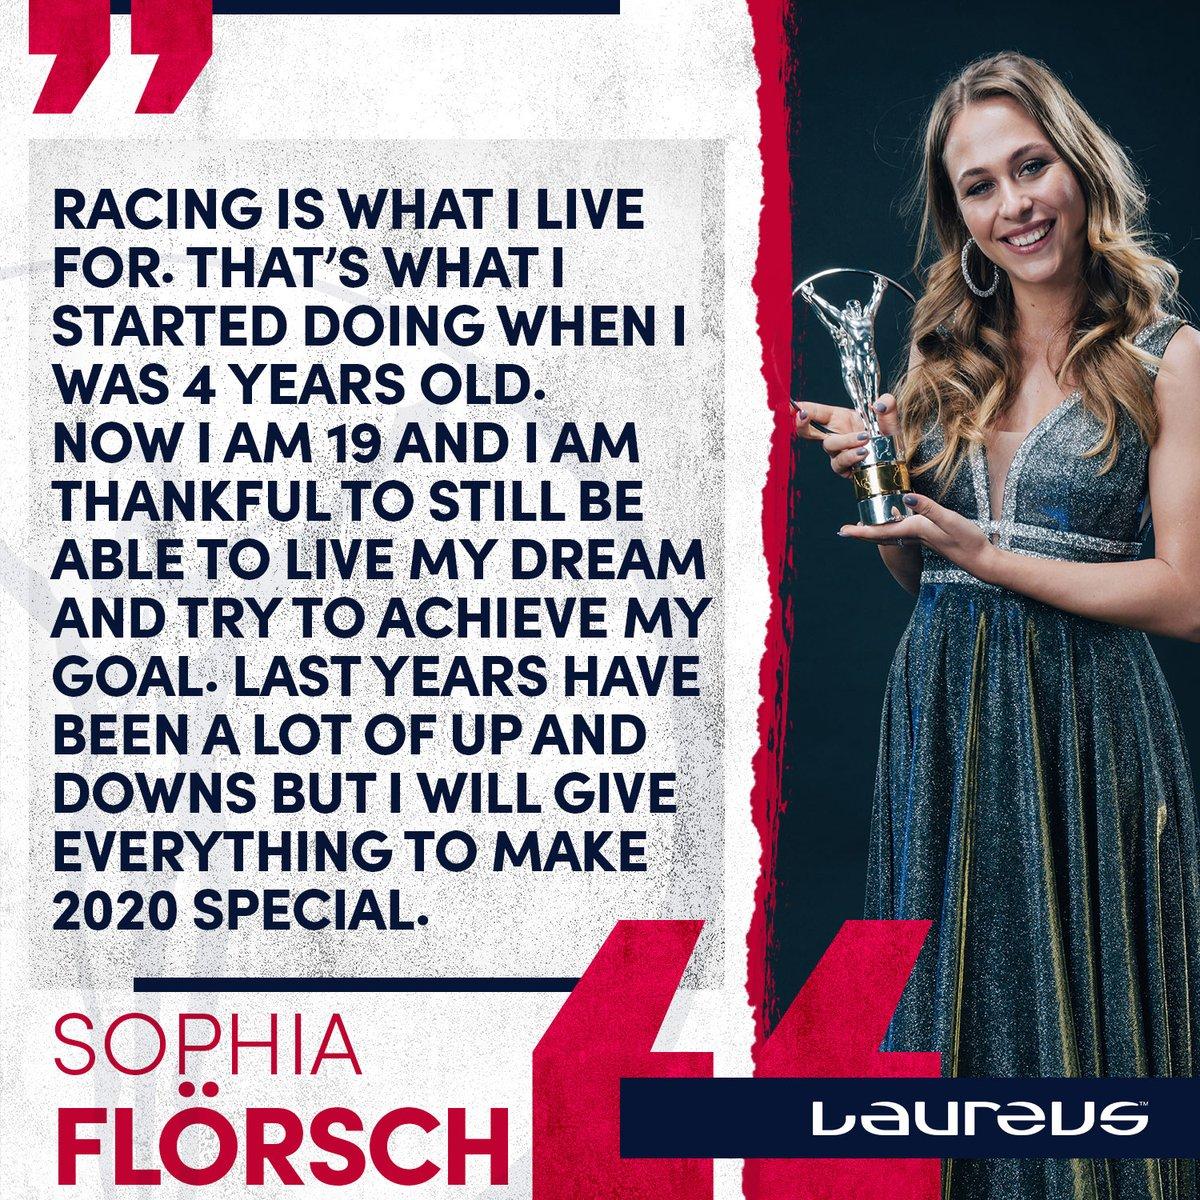 #FridayMotivation courtesy of your Laureus World Comeback of the Year, @SophiaFloersch 💪